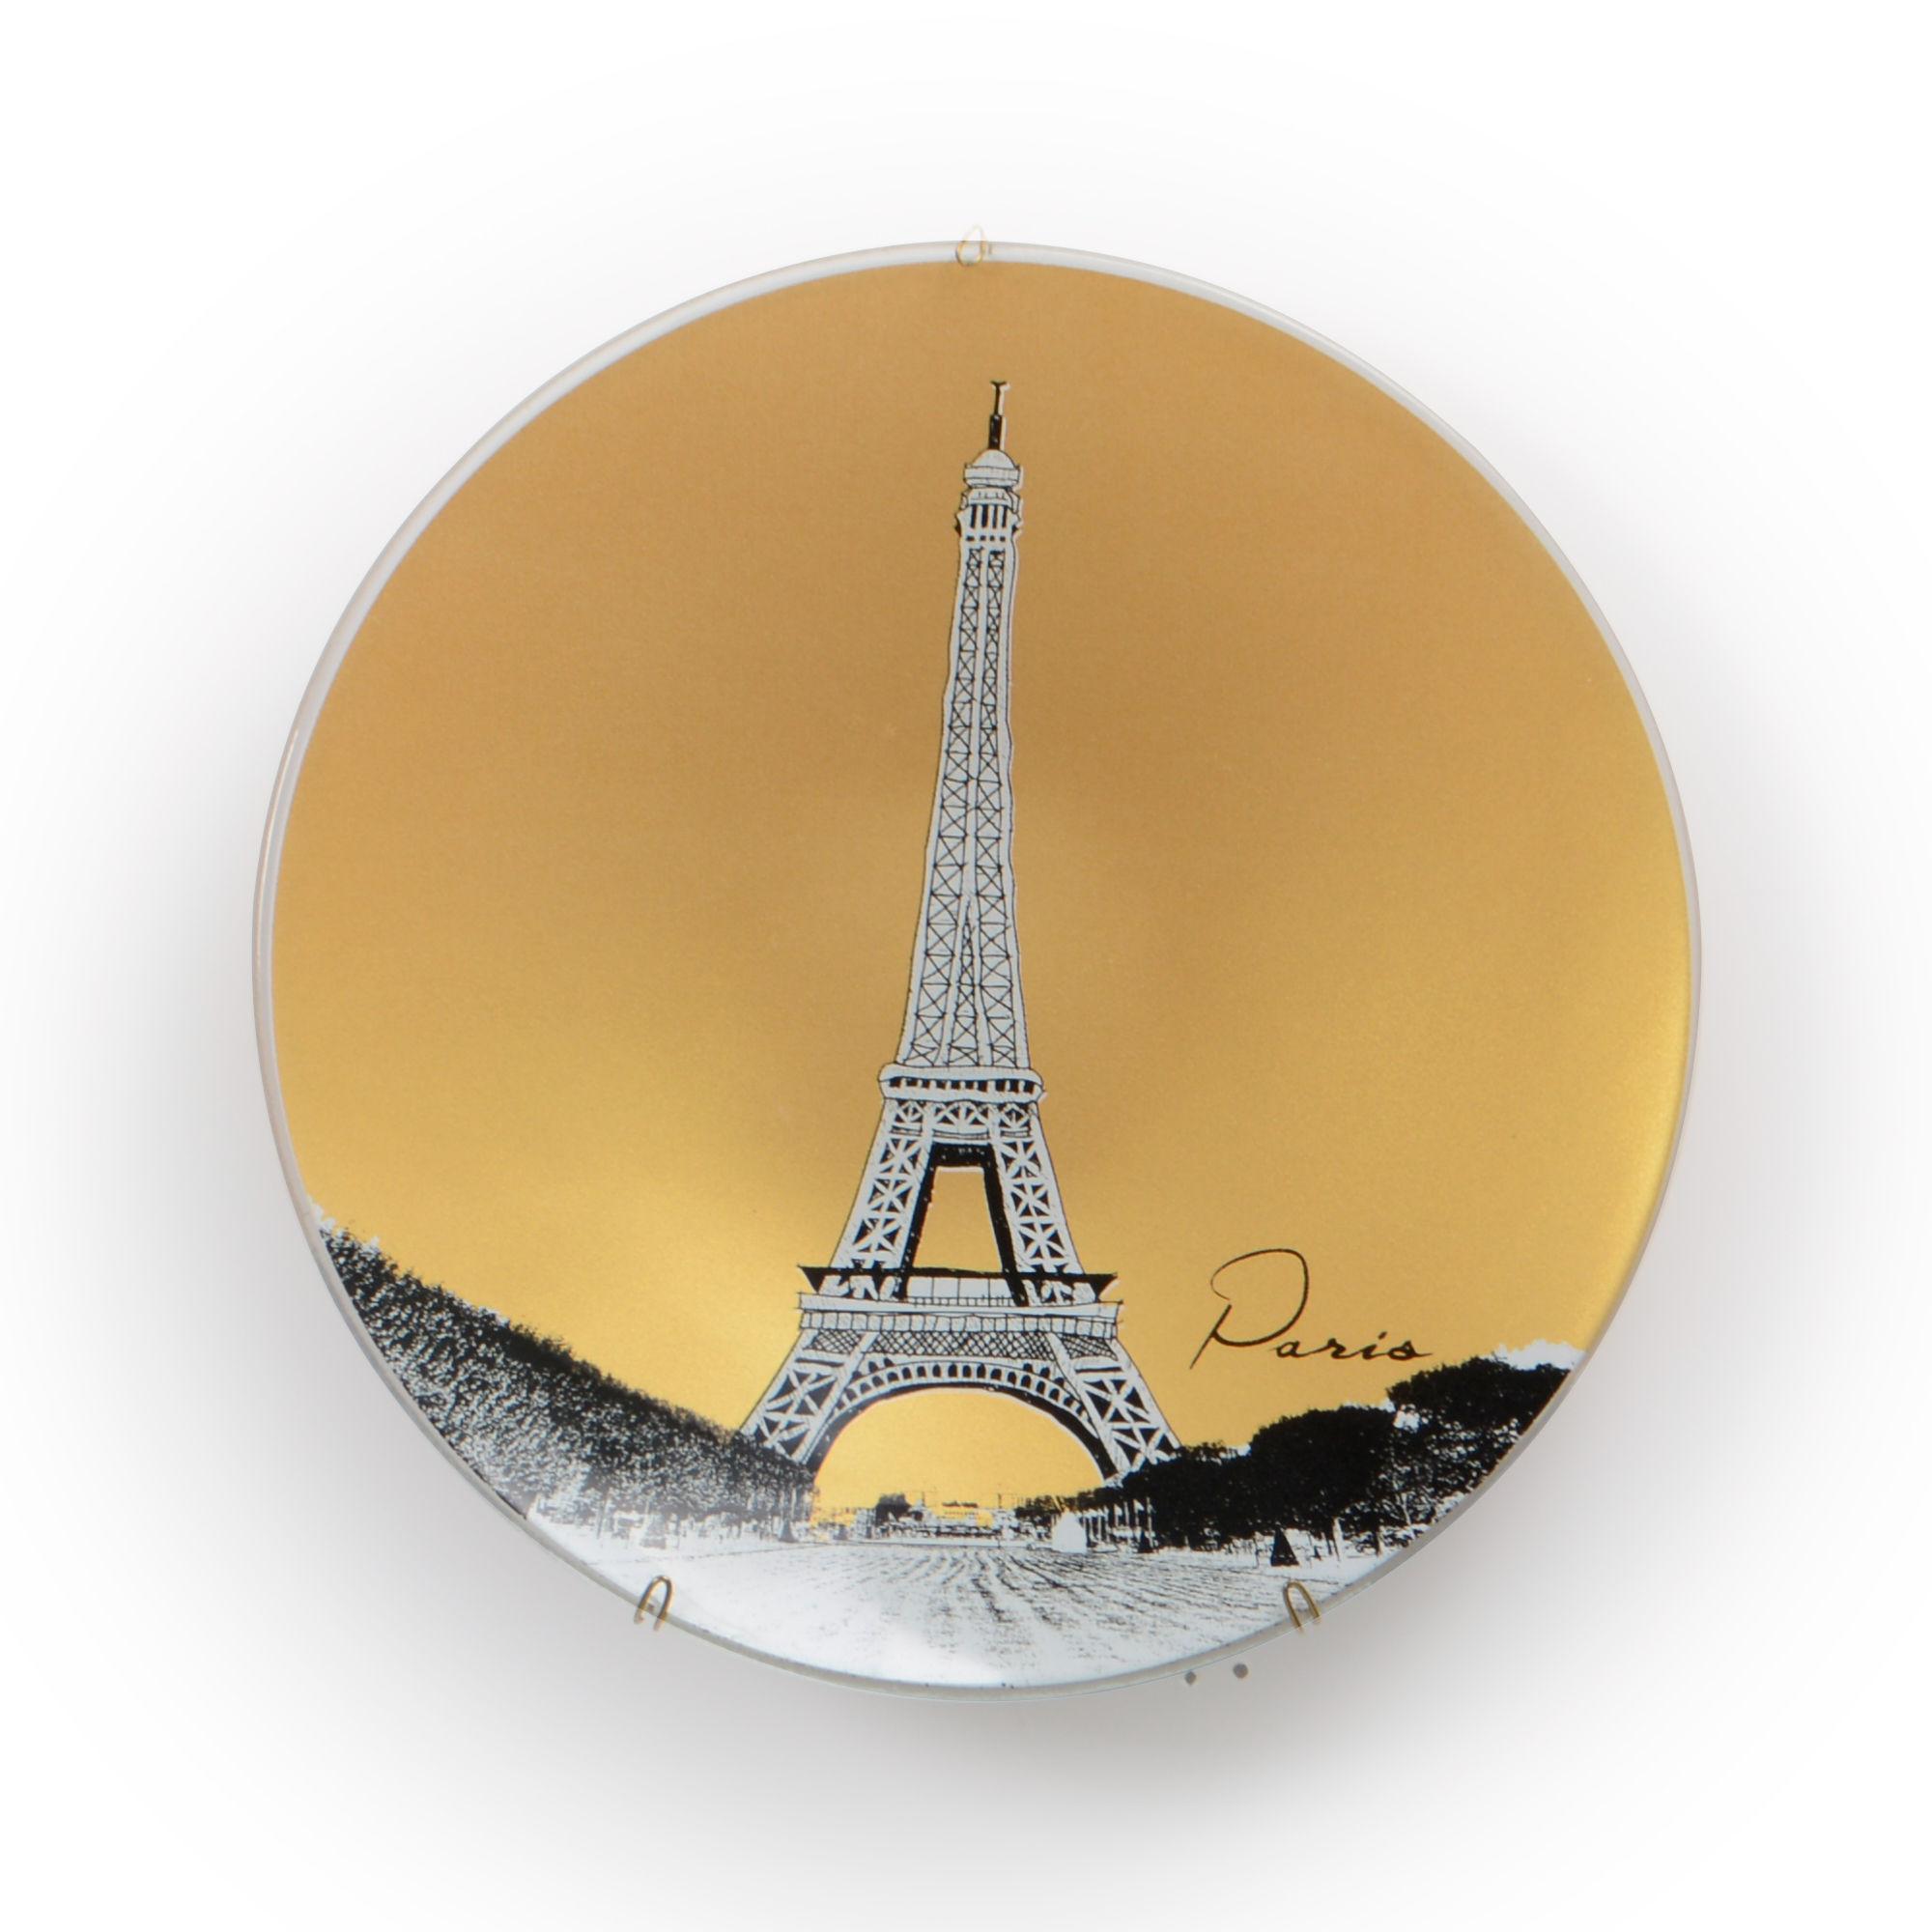 Prato de parede Paris